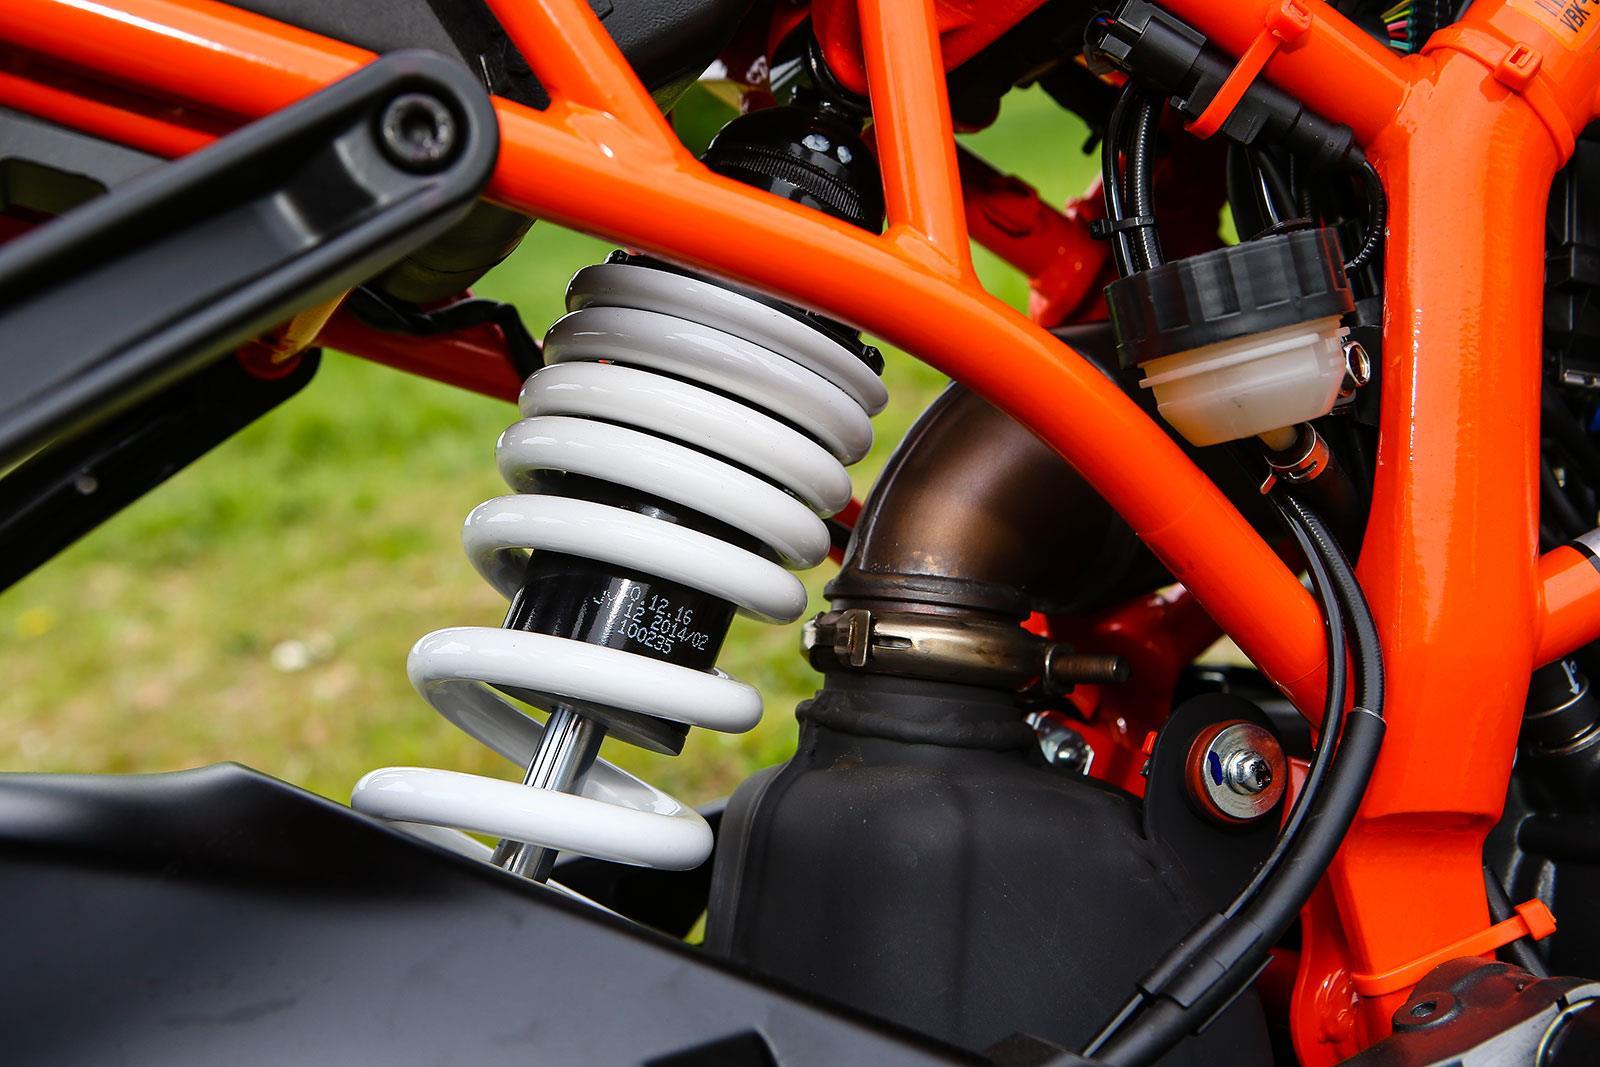 KTM RC390 rear shock